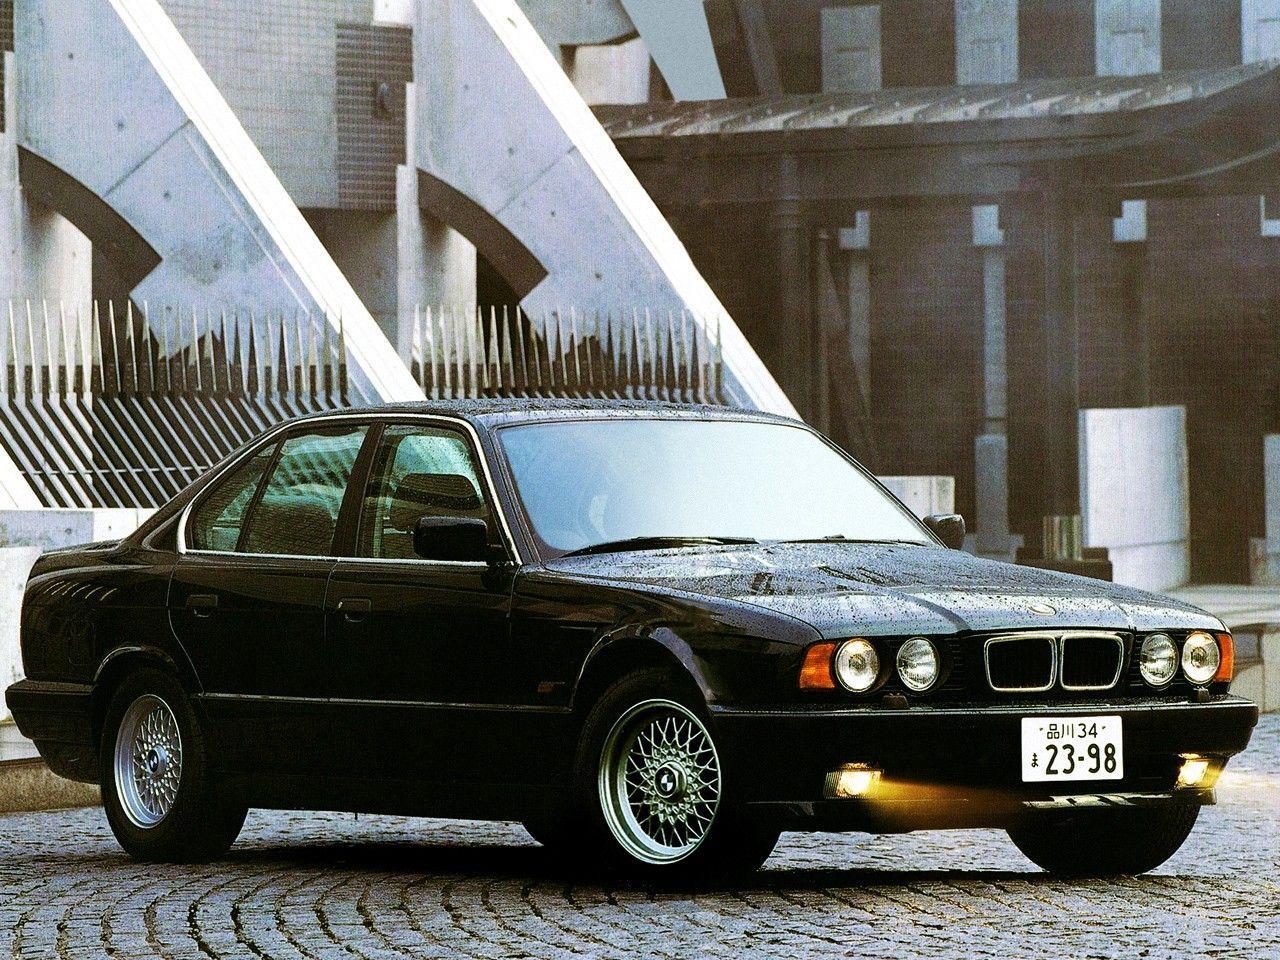 BMW E34 Wallpapers  Wallpaper Cave